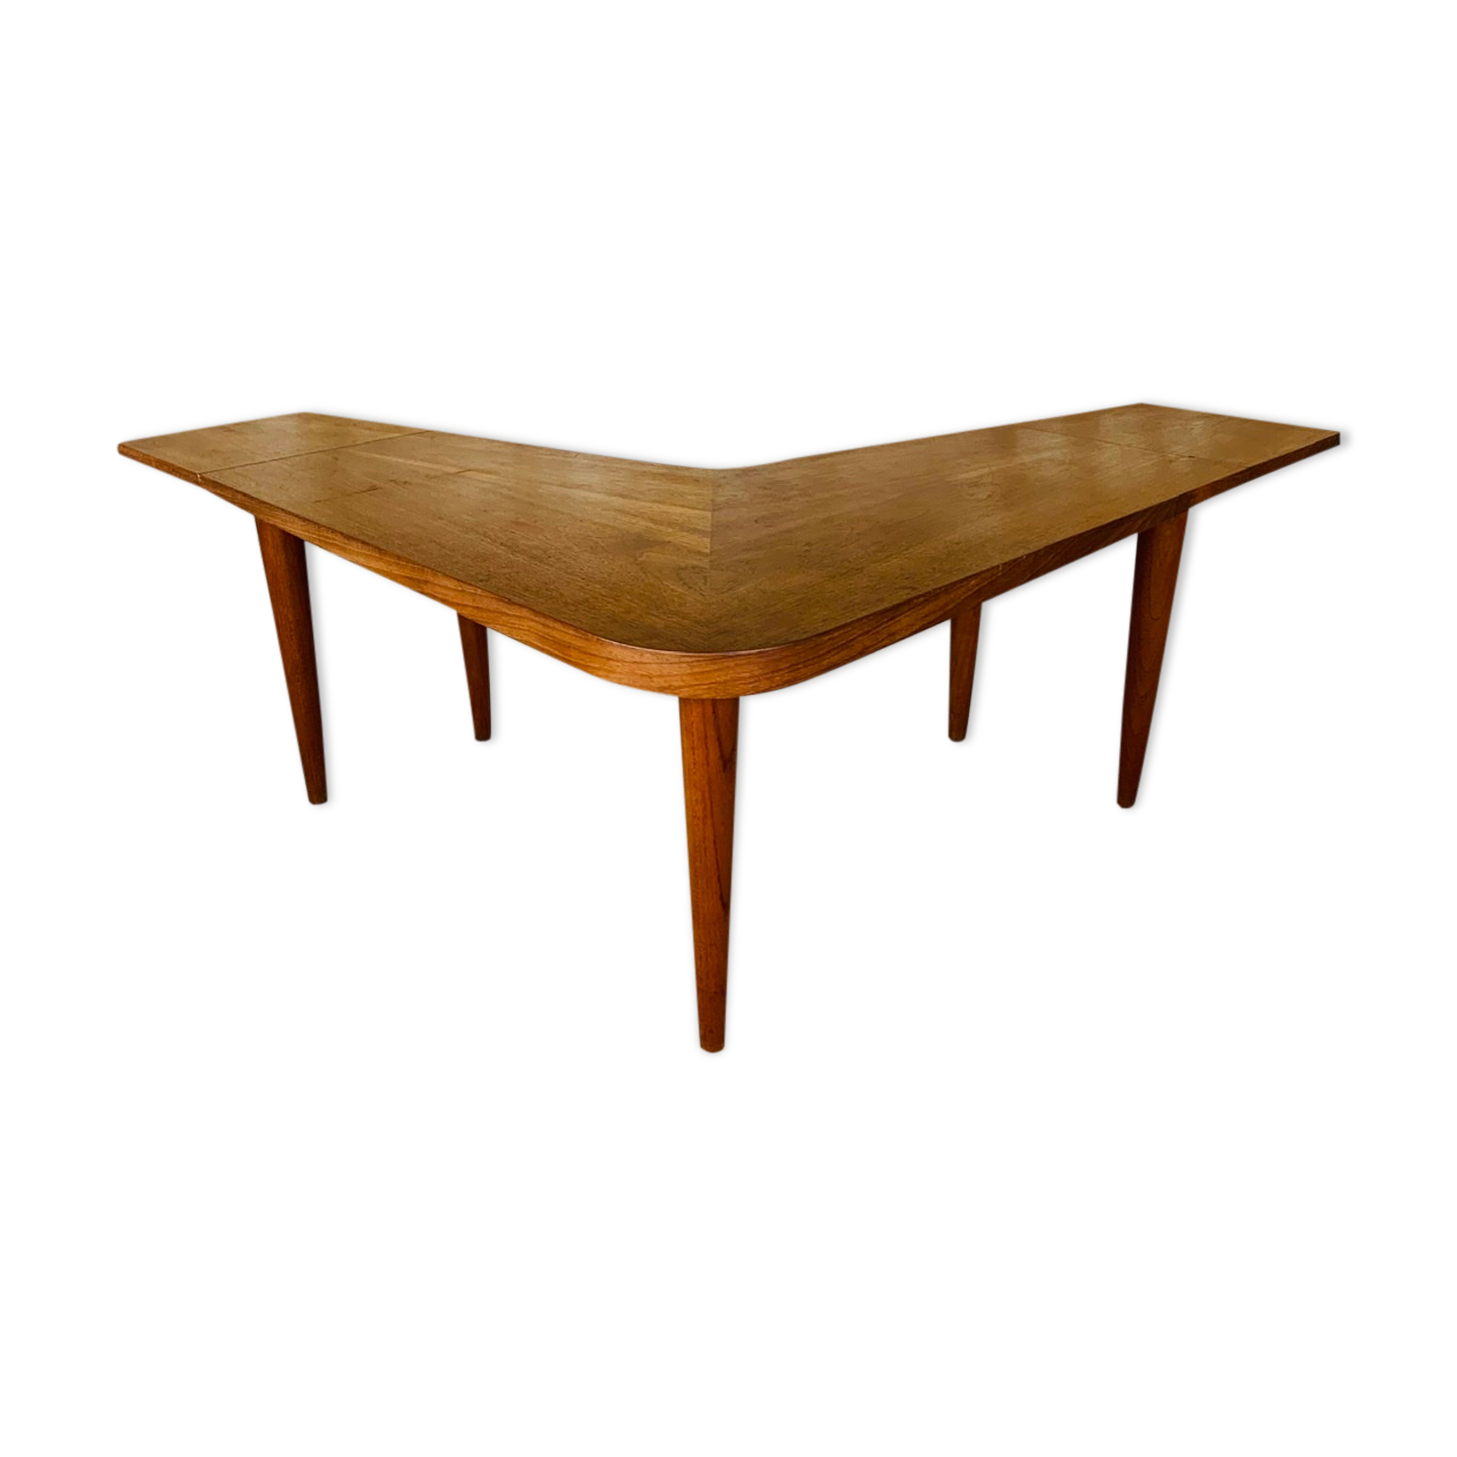 Table basse boomerang scandinave vintage avec allonges pliantes par Samcom, 1960